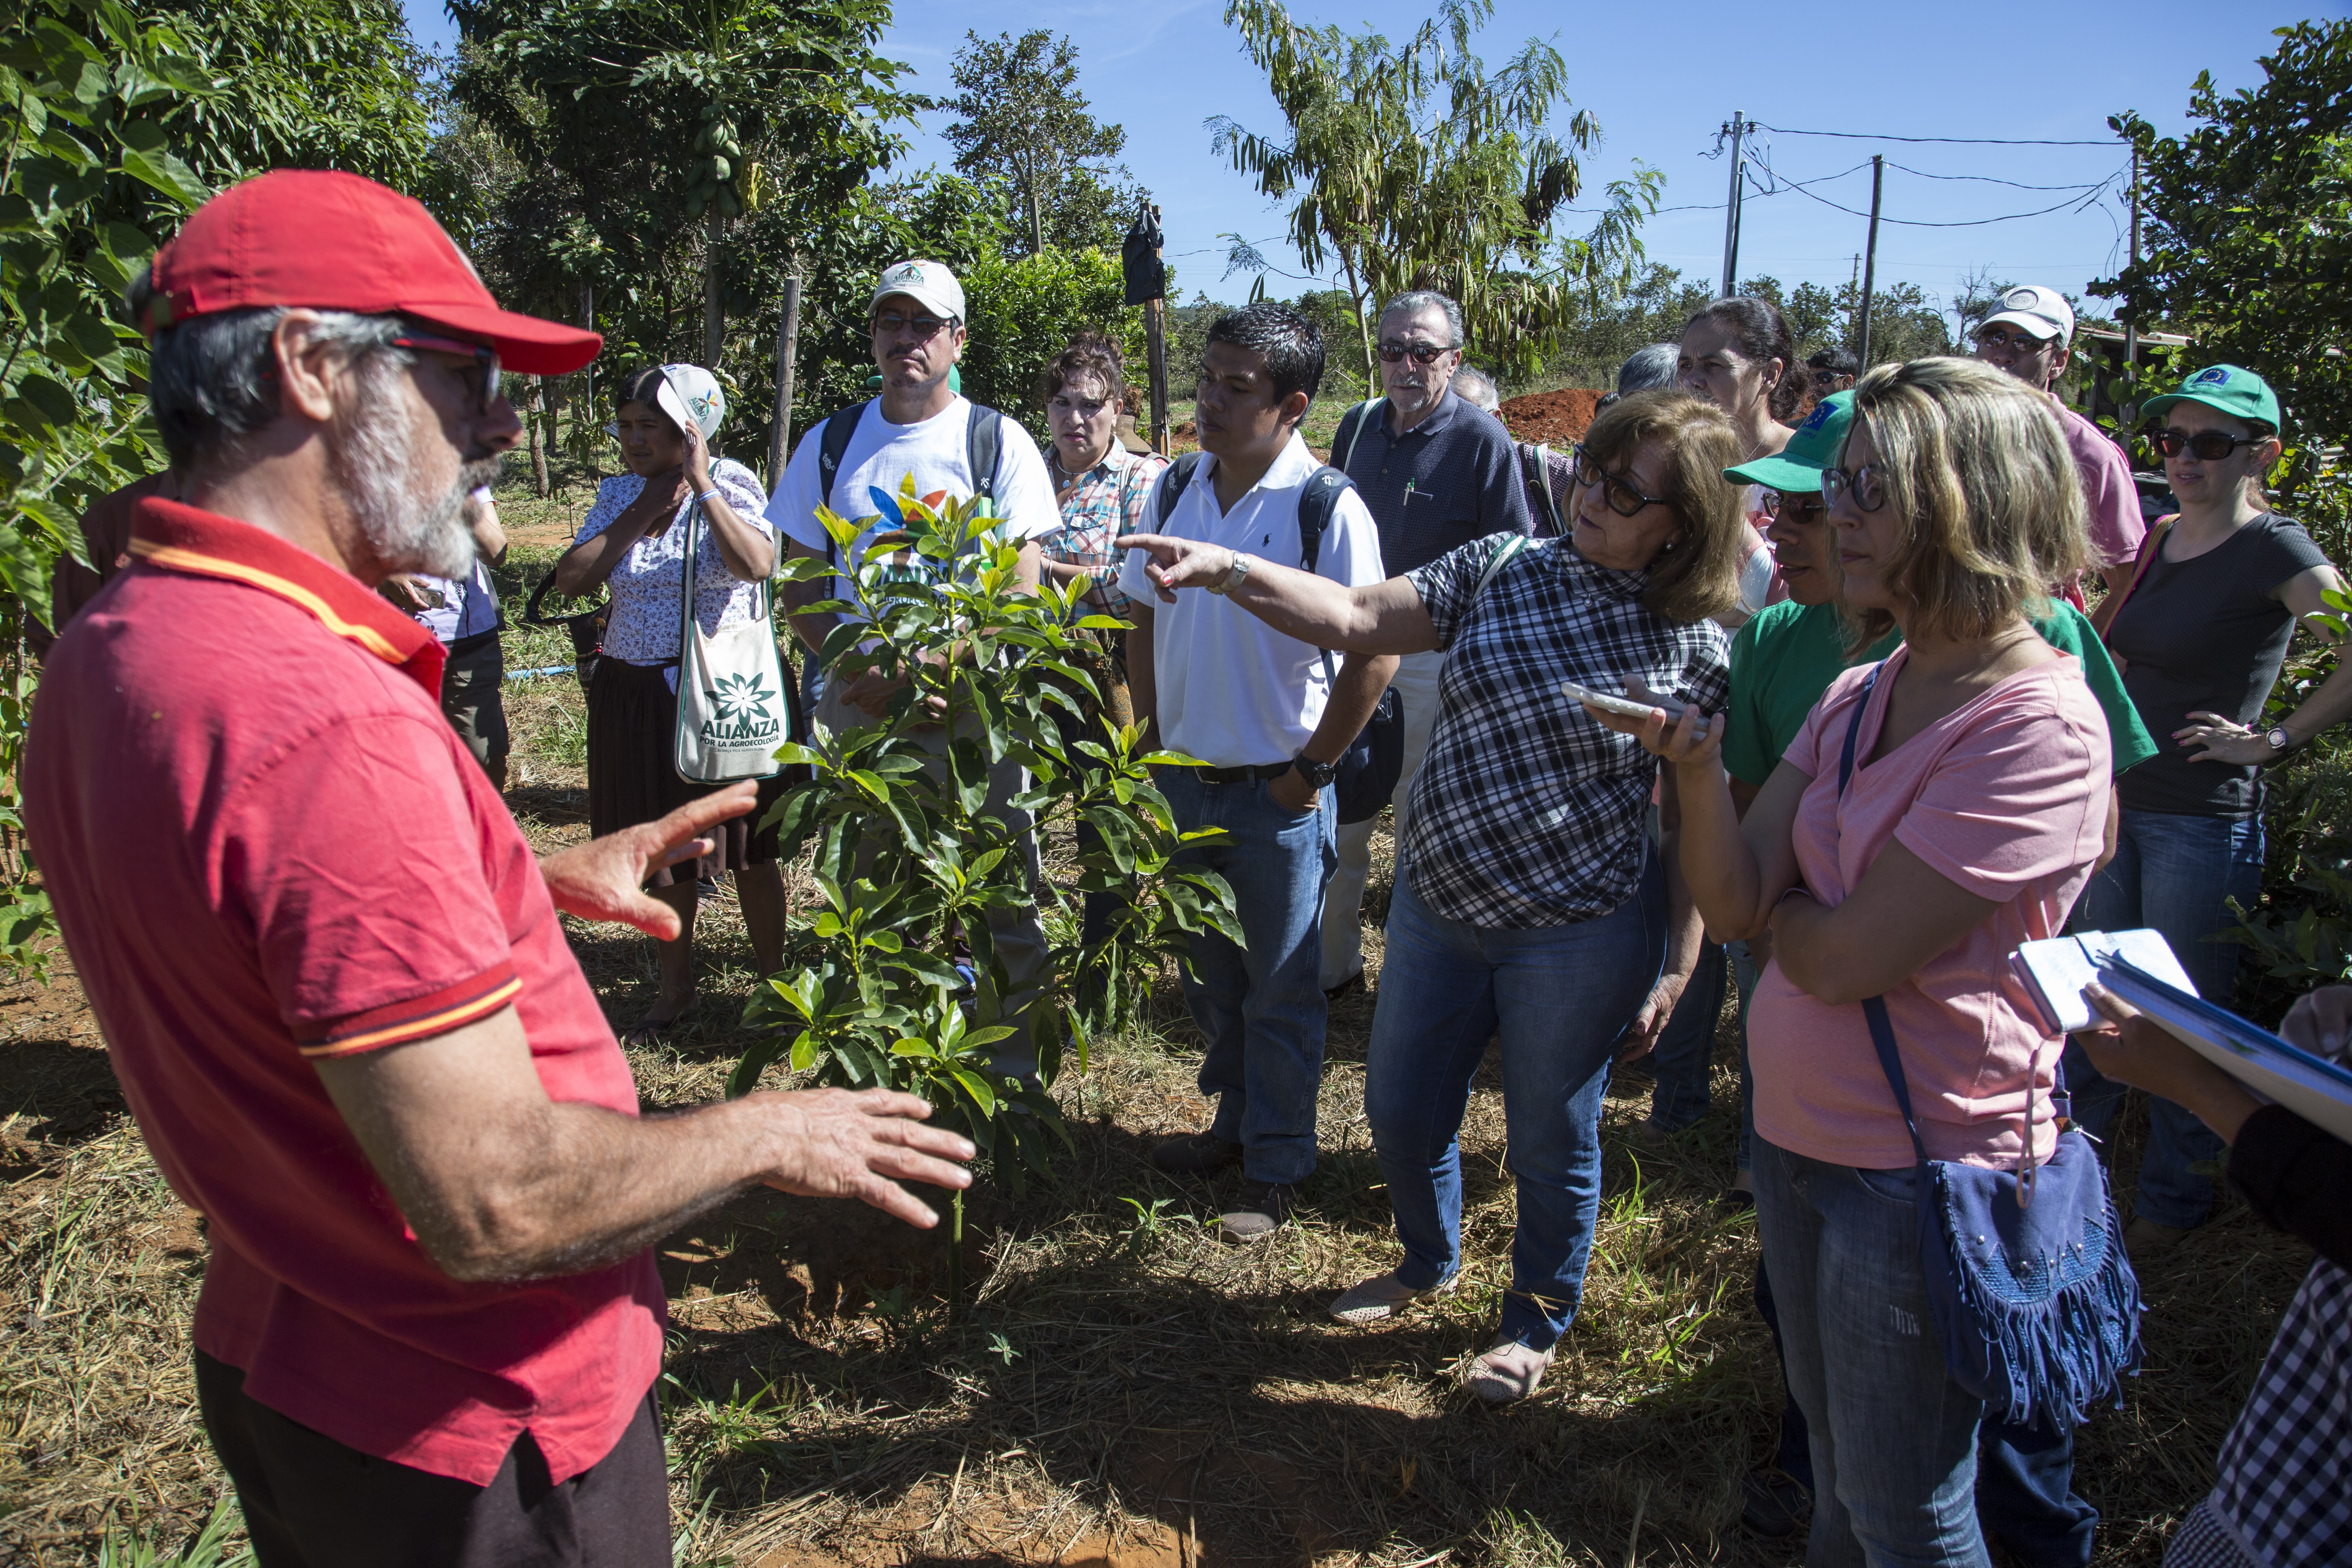 Seminario Internacional Alianza por la Agroecologia. Brasilia Maio de 2017. Visita ao Assentamento Pequeno Wiloian em Planaltina/DF. Foto de Ubirajara Machado